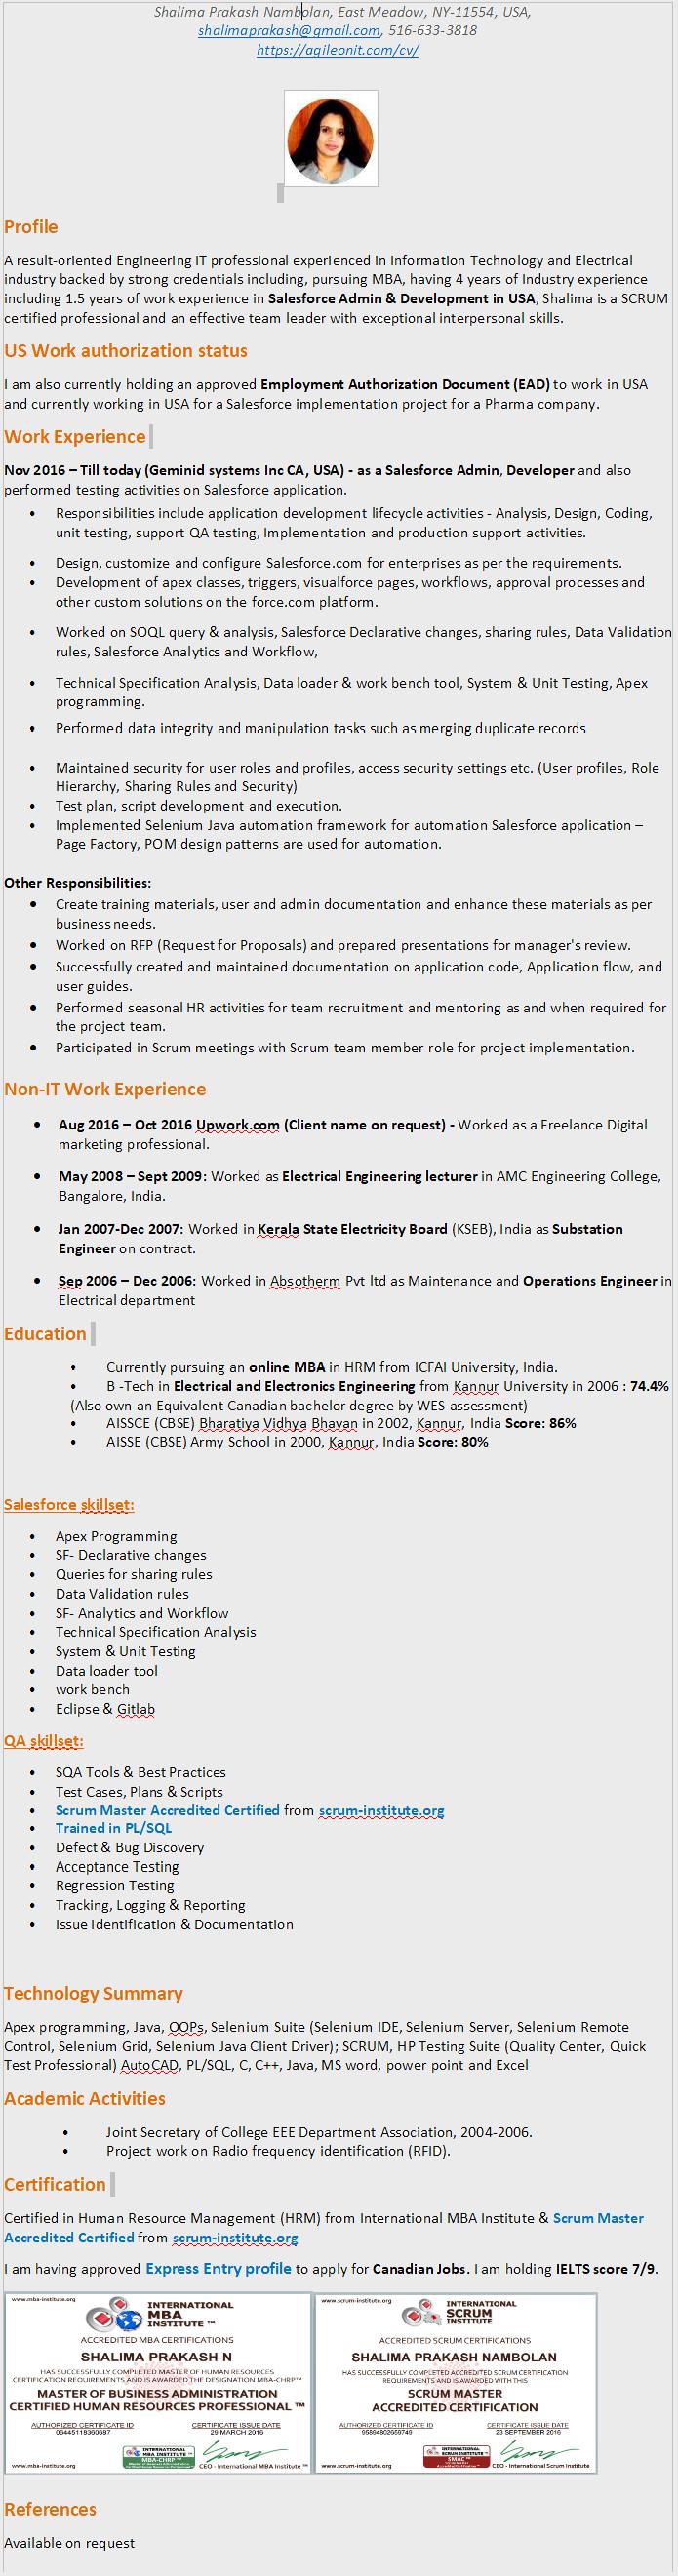 cv | Blog | Internet tricks | Automation testing Framework ...